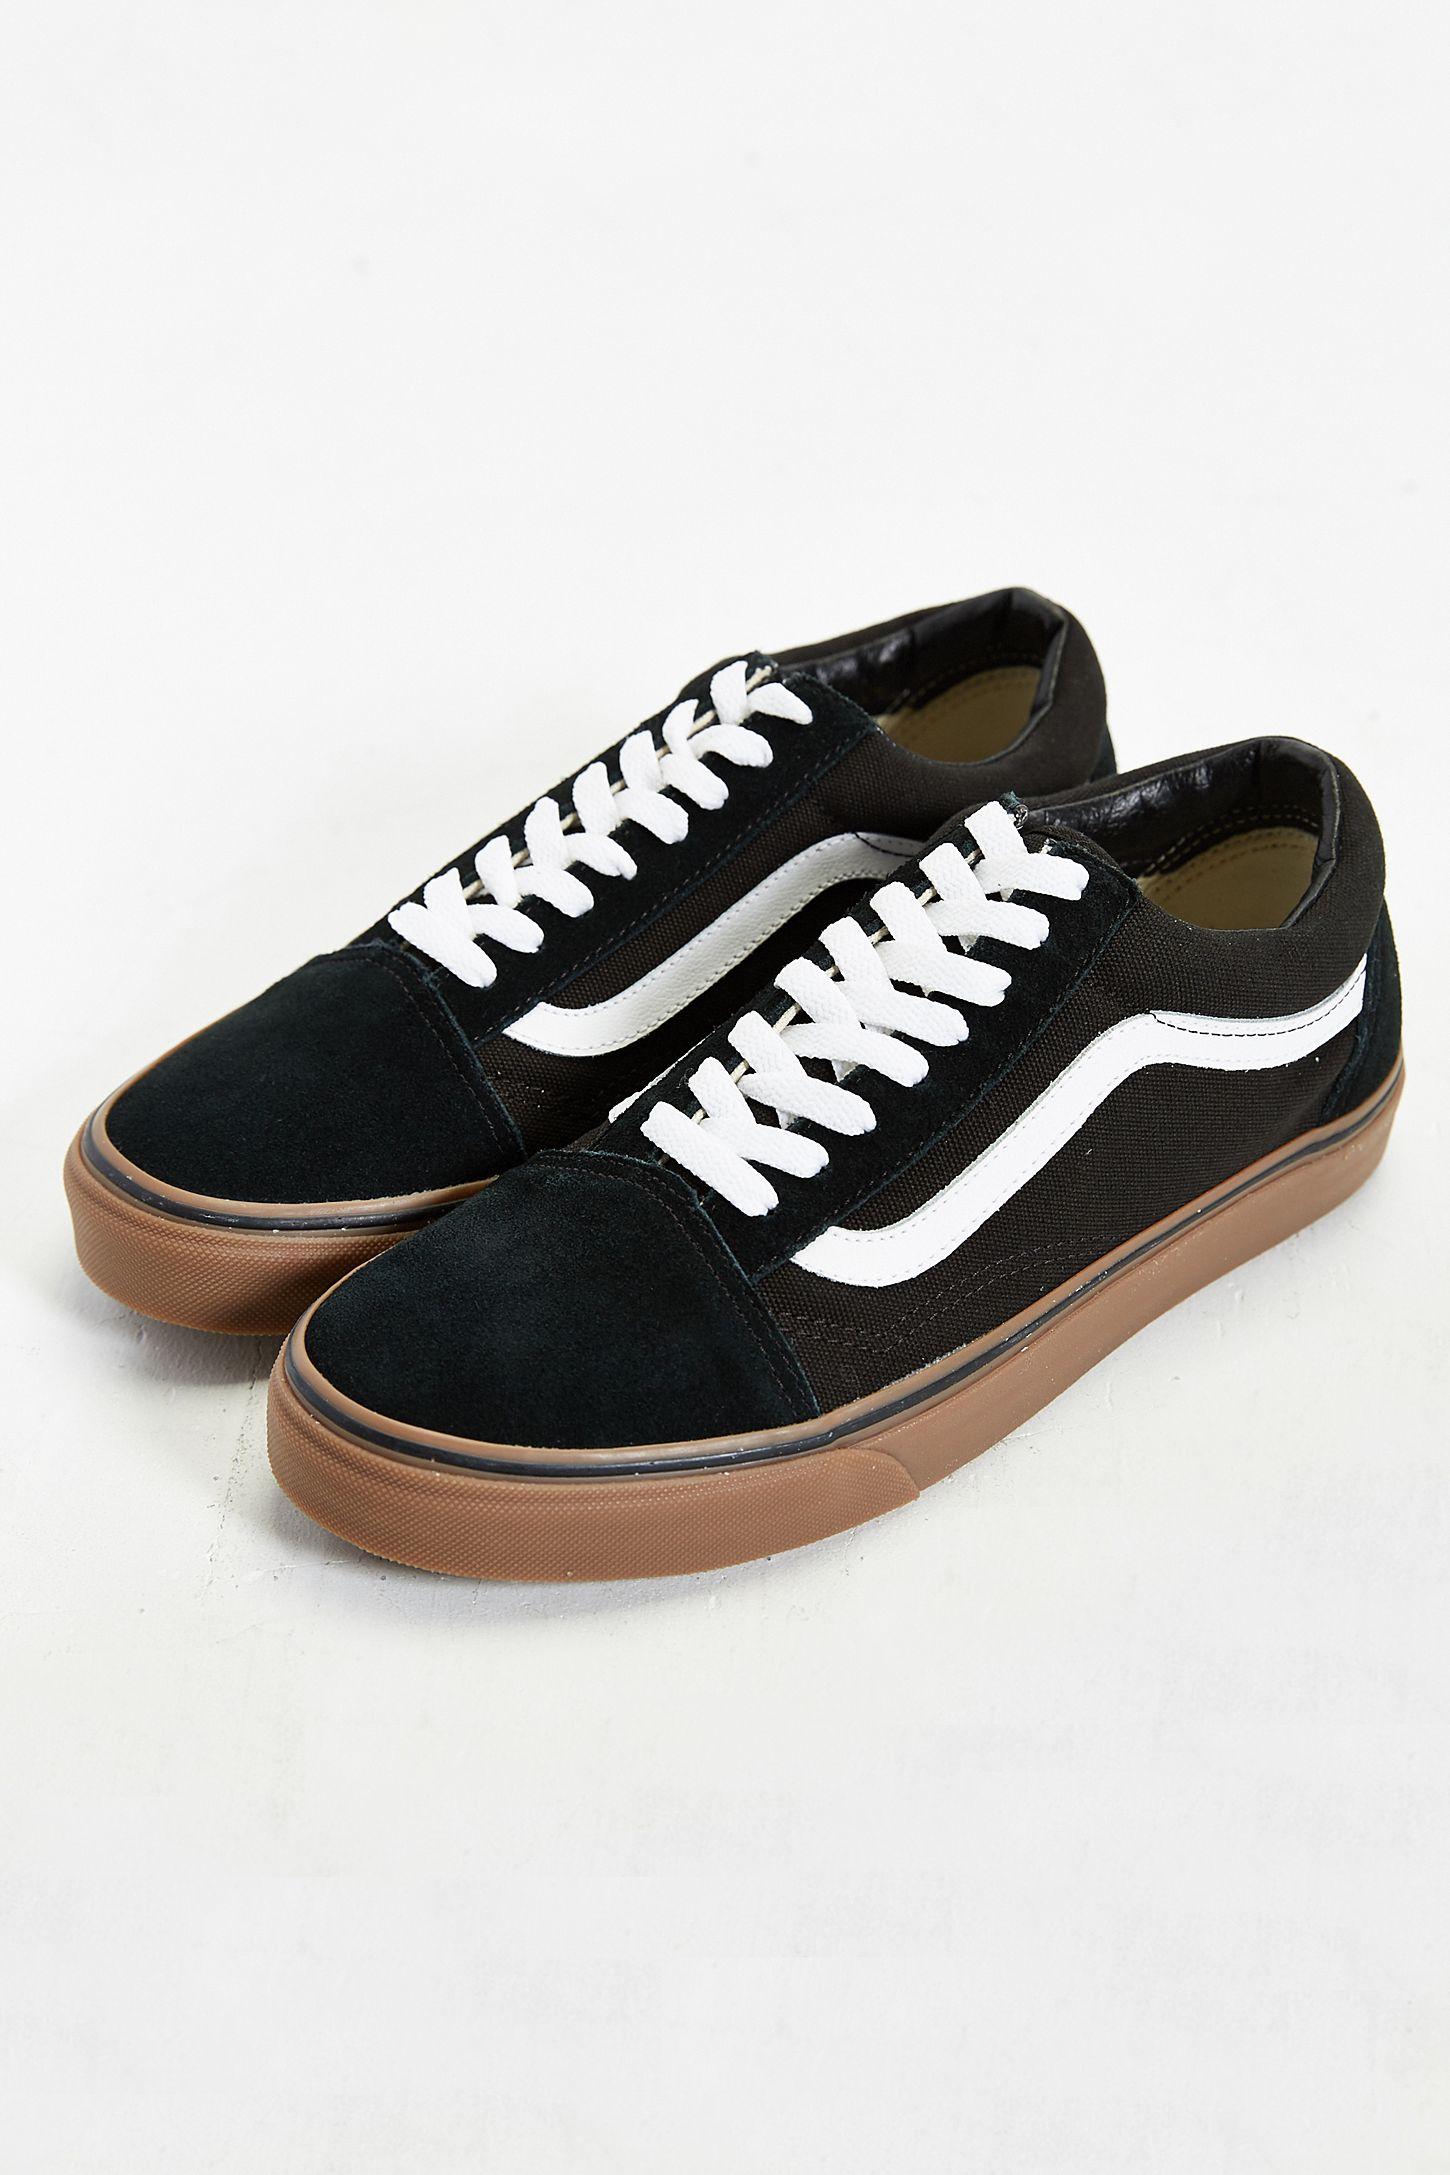 7573e6dd75 Vans Old Skool Gum Sole Sneaker